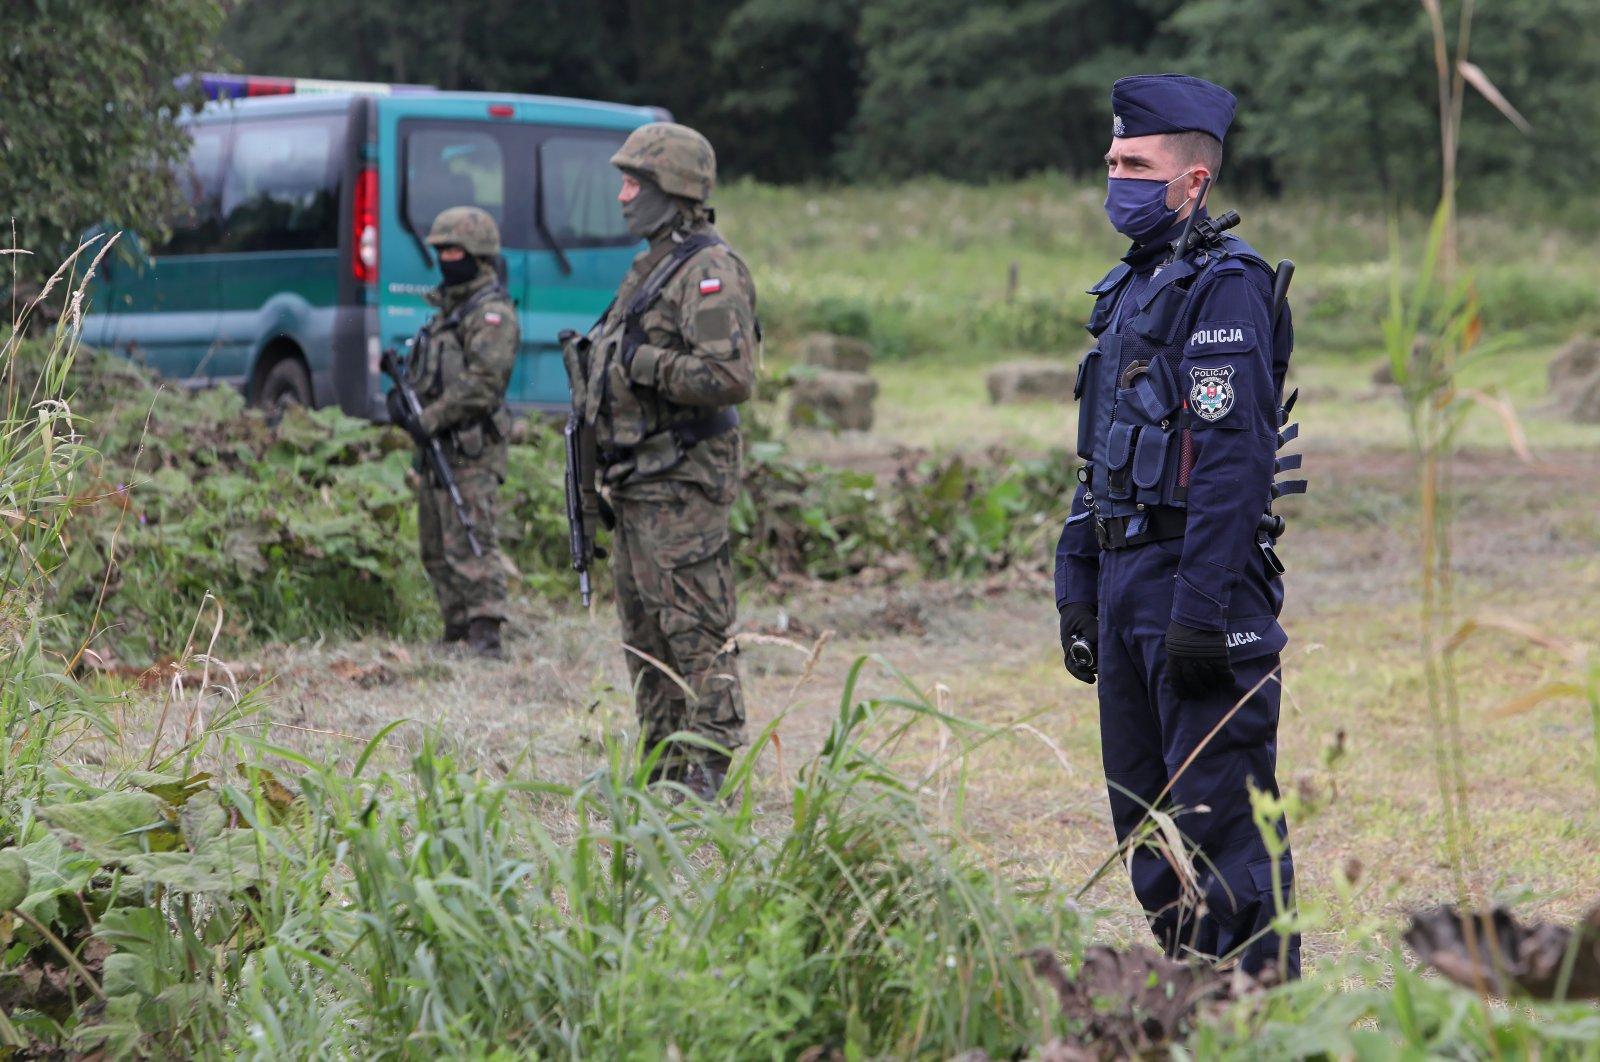 Polish police and border guards stand at the Polish-Belarusian border near Usnarz Gorny village, northwestern Poland, Aug. 24, 2021. (EPA Photo)